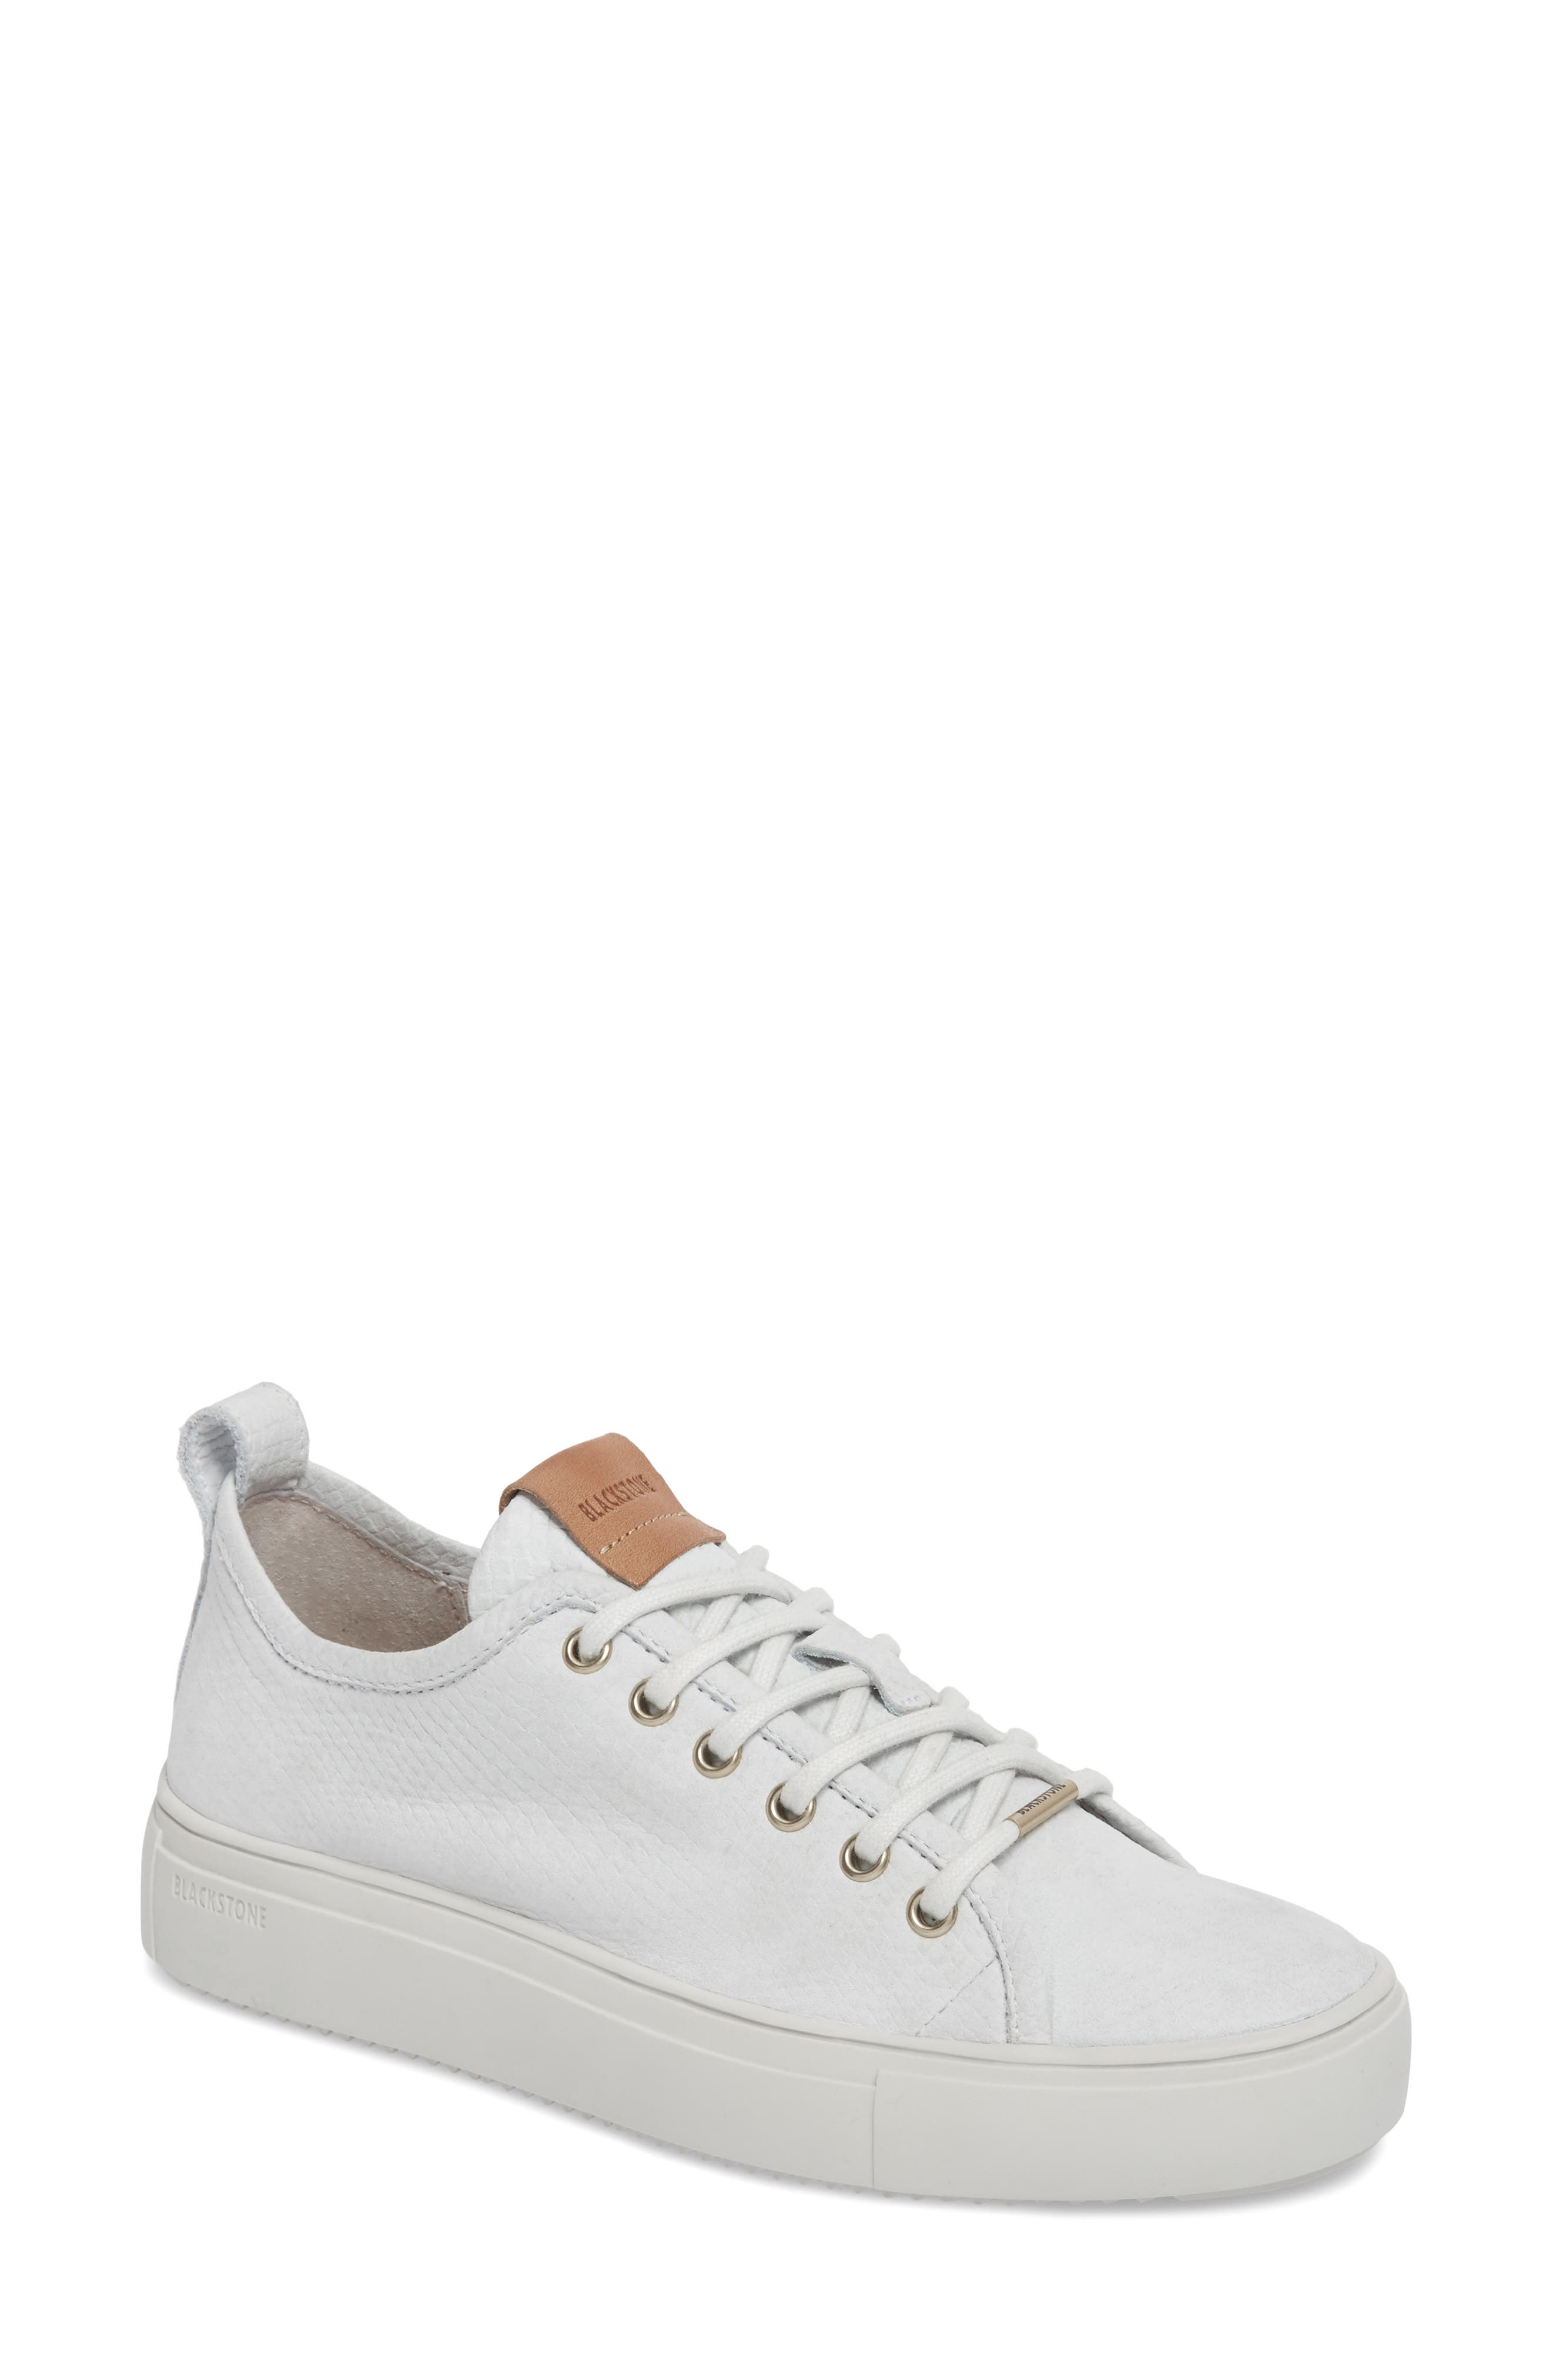 Blackstone Pl90 Sneaker, White